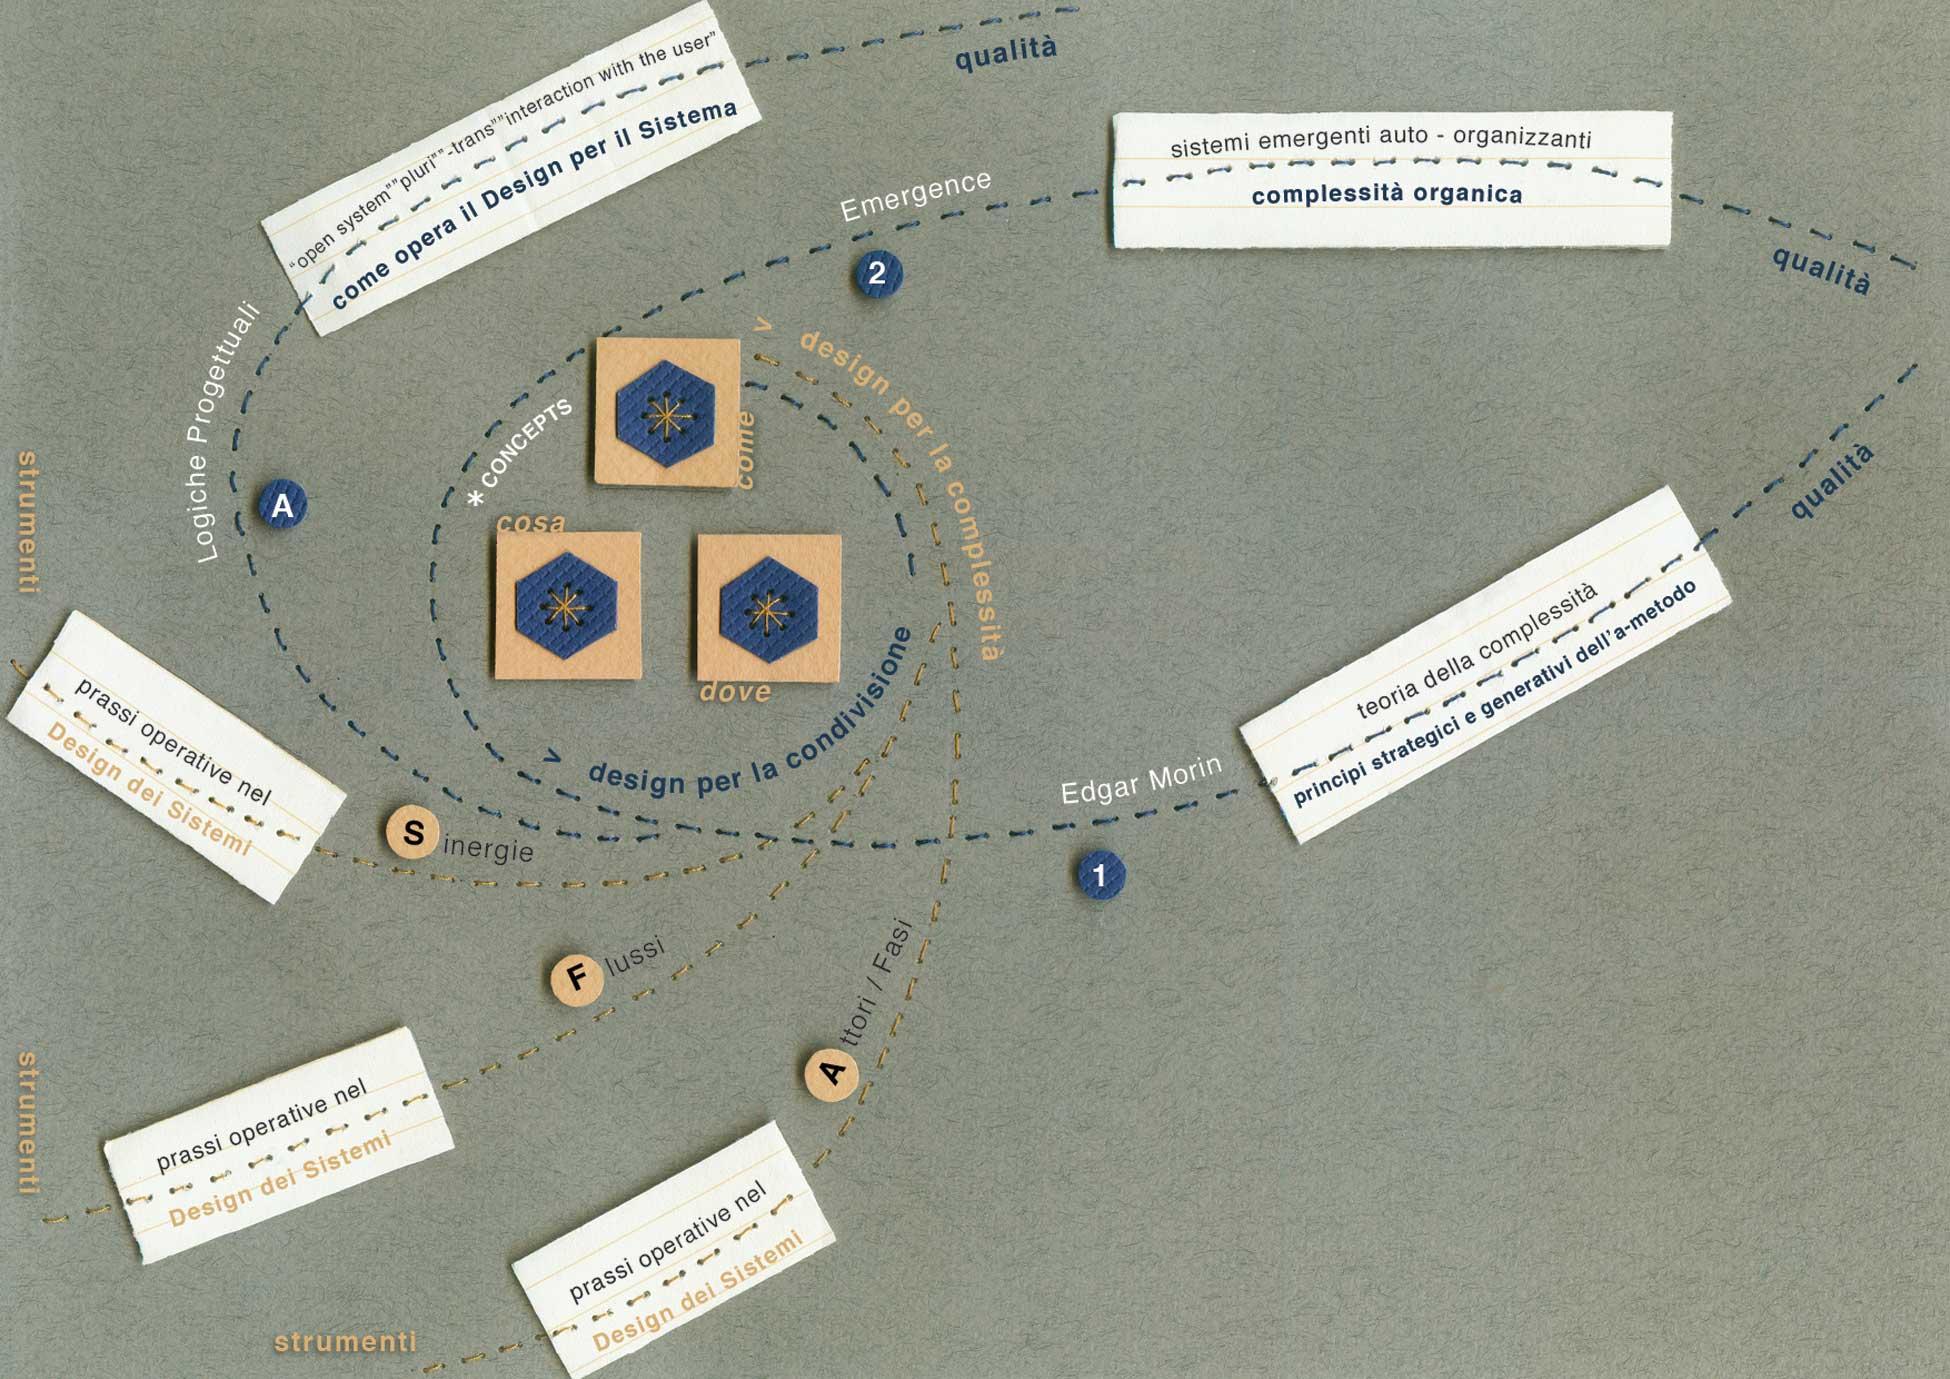 mappa delle strategie